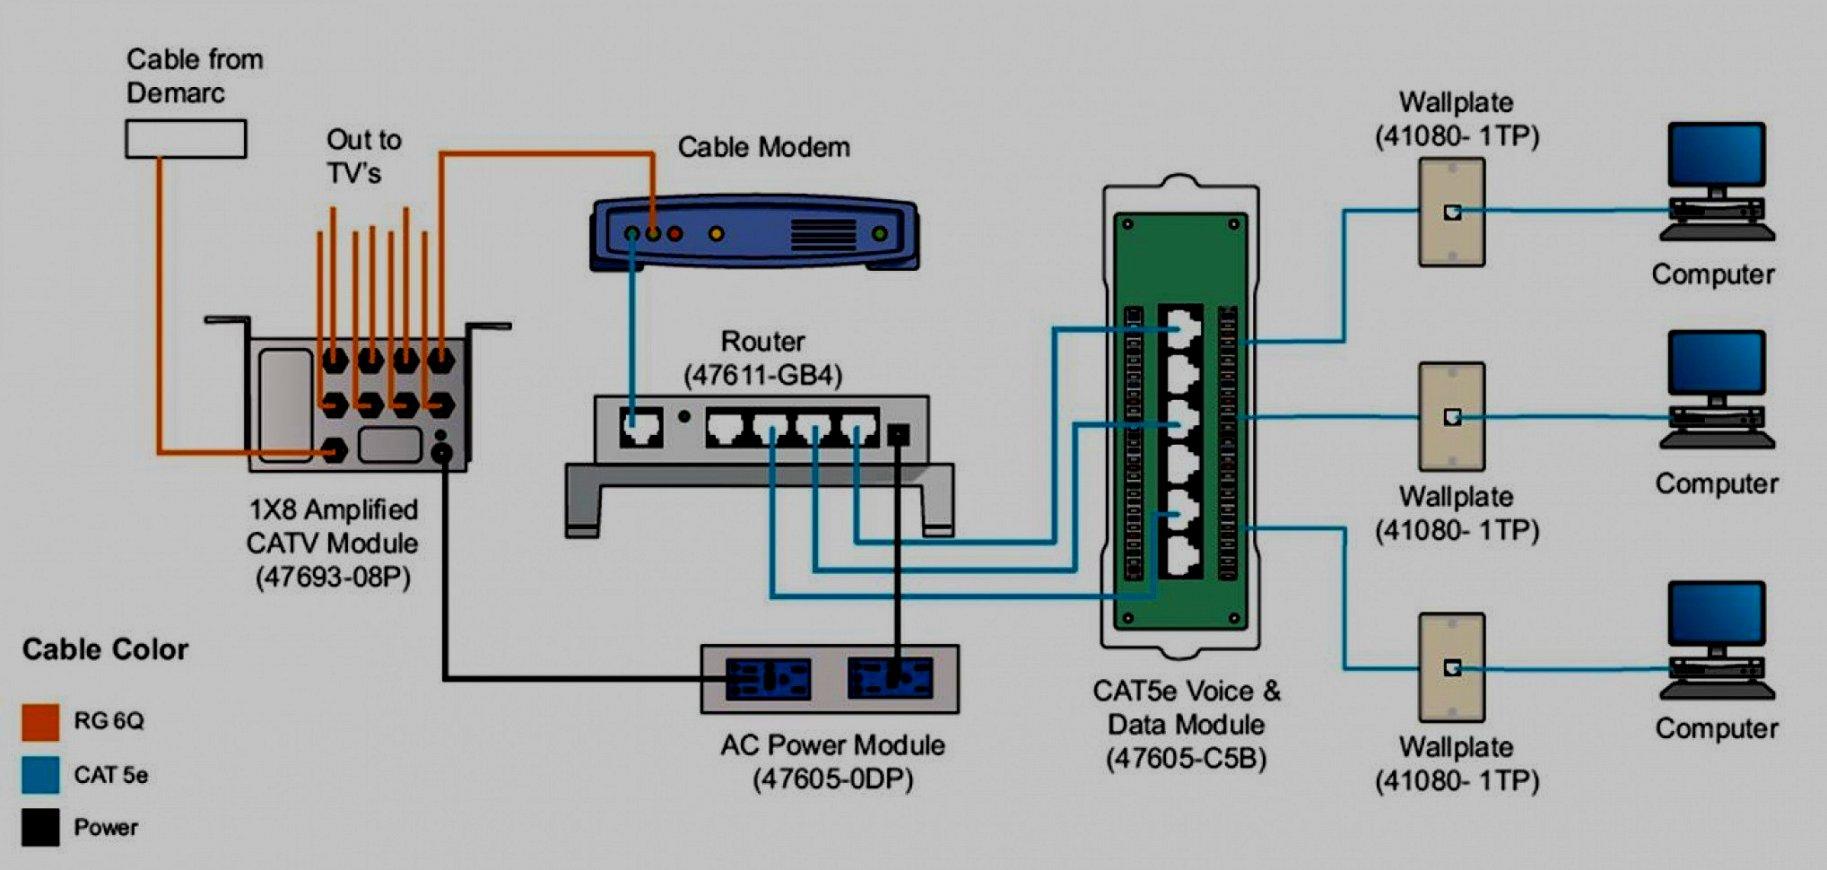 Cat5 Wiring Home | Wiring Diagram - Cat5 Phone Line Wiring Diagram